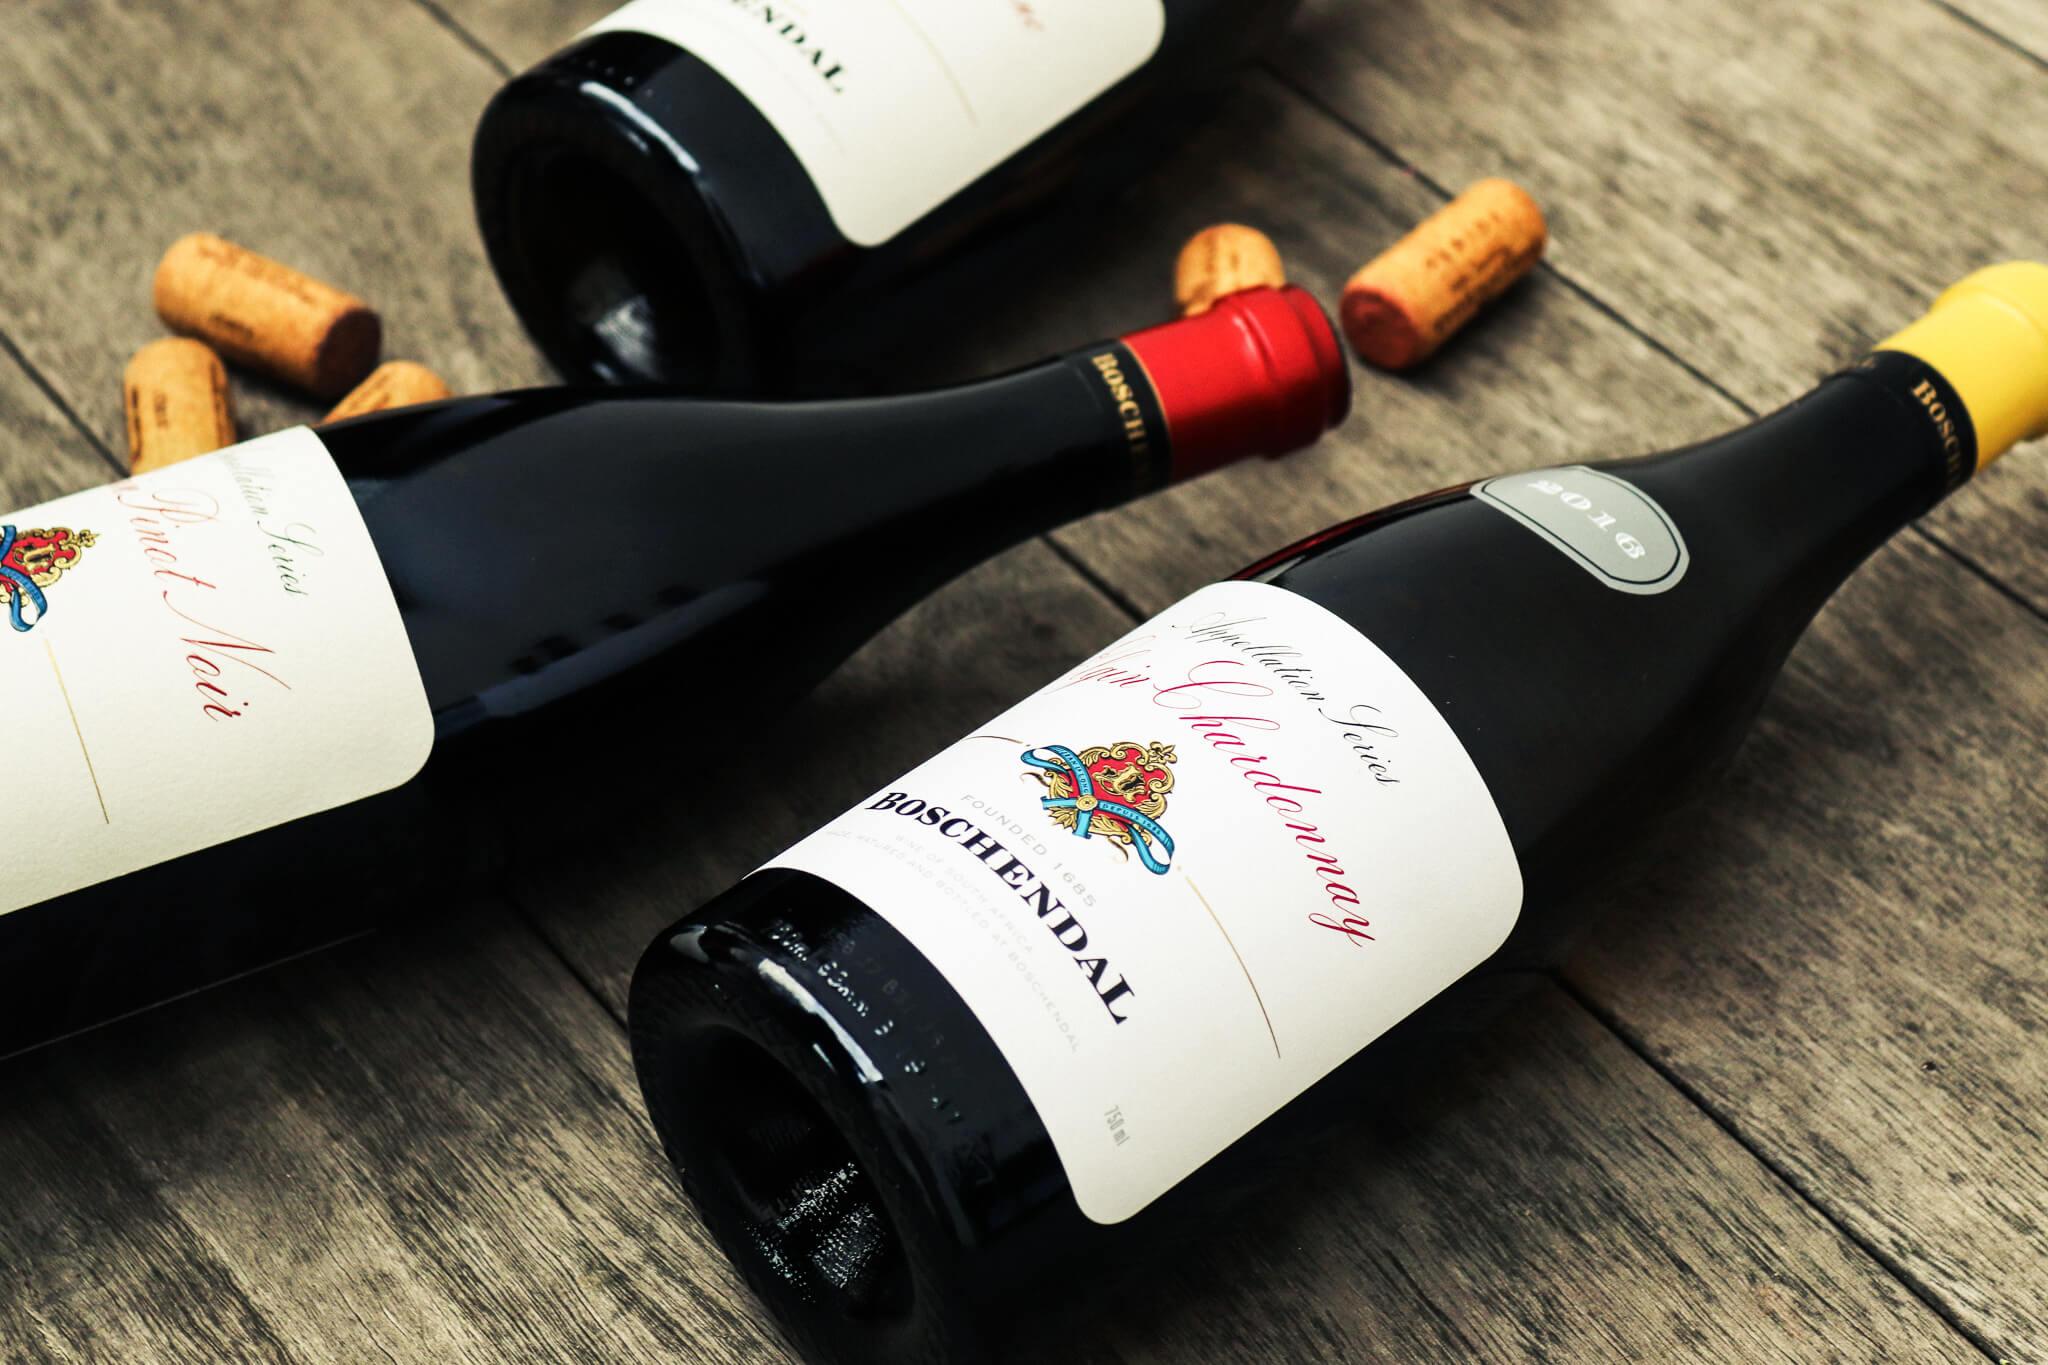 Get A Taste Of The Award-Winning Wines Of Boschendal photo